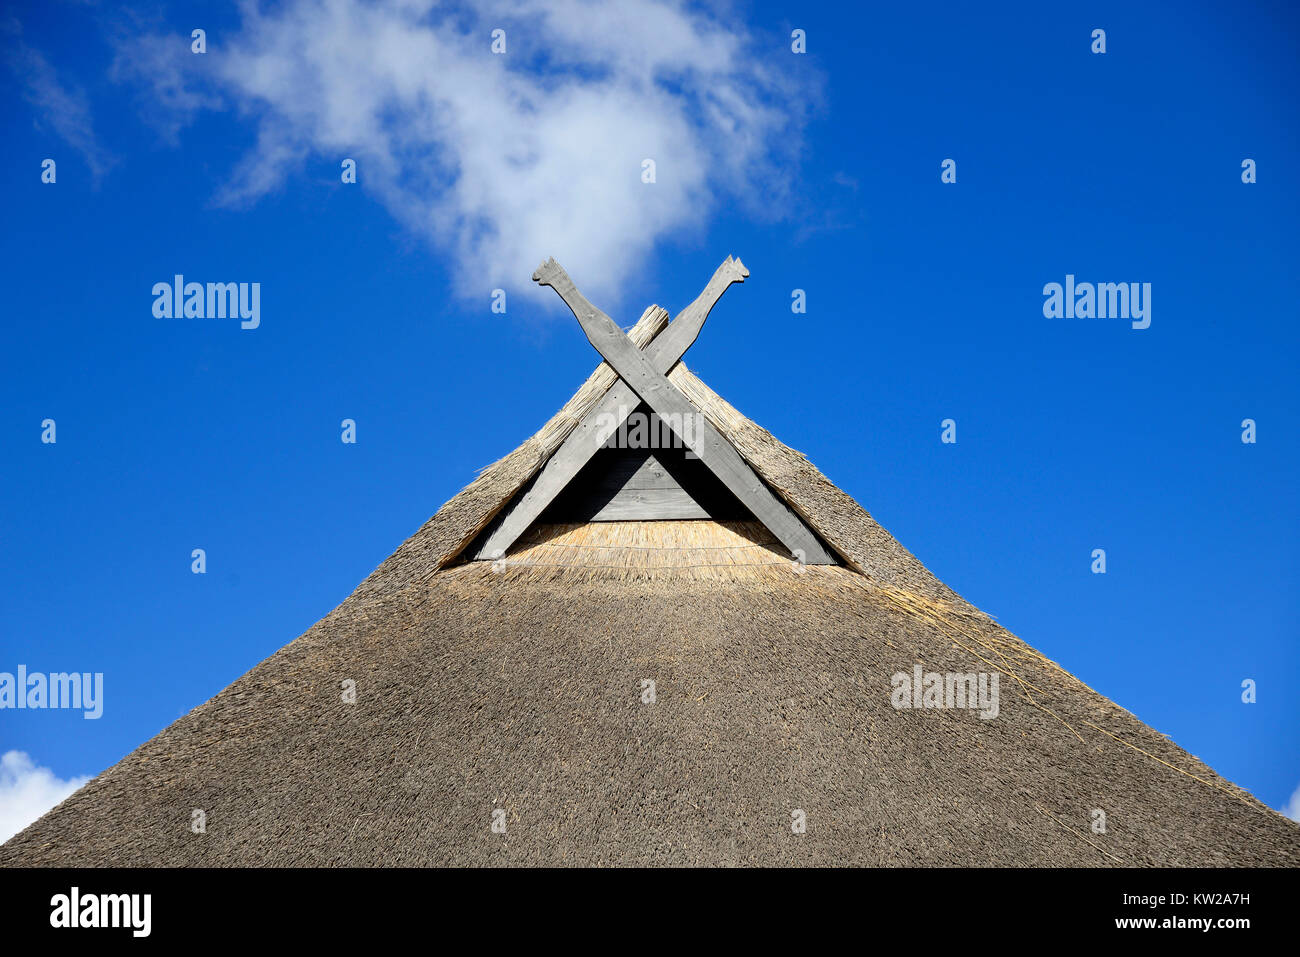 Wismar, wind boards in the fishing house in lifting, Windbretter am Fischerhaus in Hoben - Stock Image